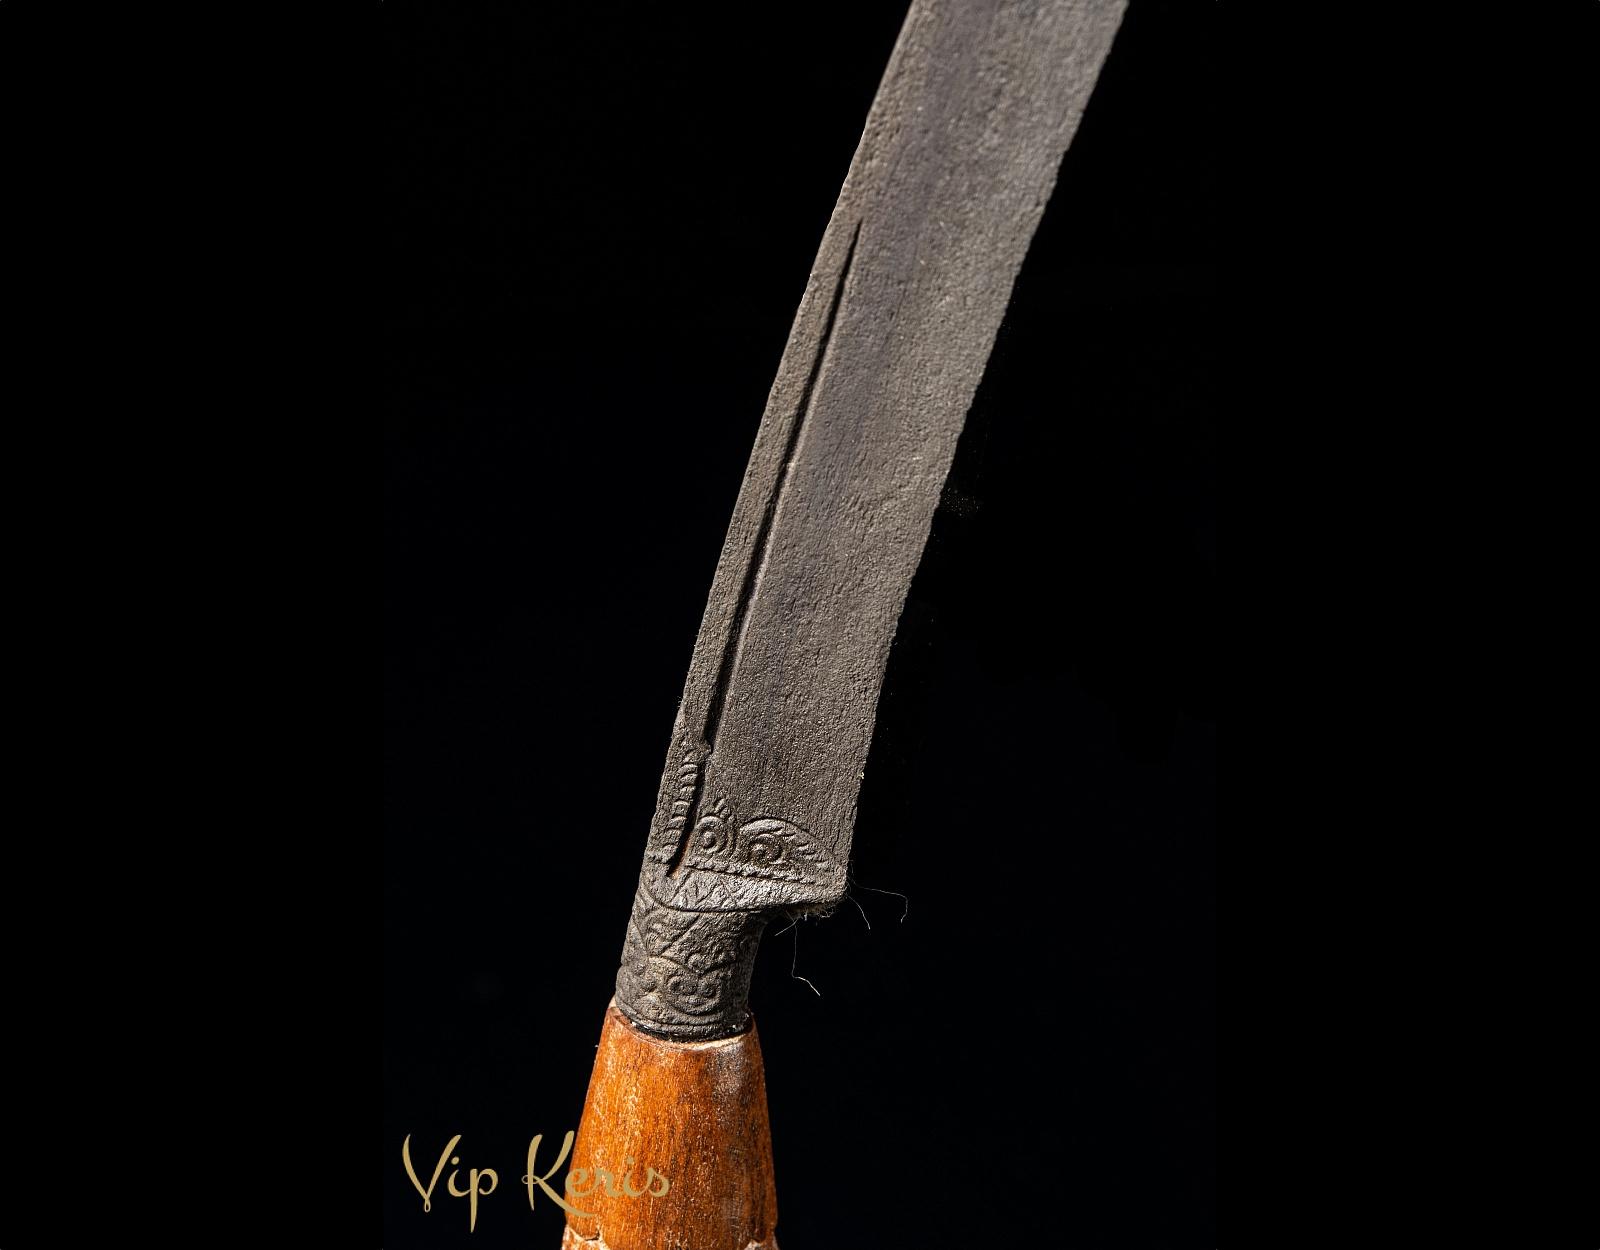 Ритуальный Badik tumbuk ladu фото VipKeris